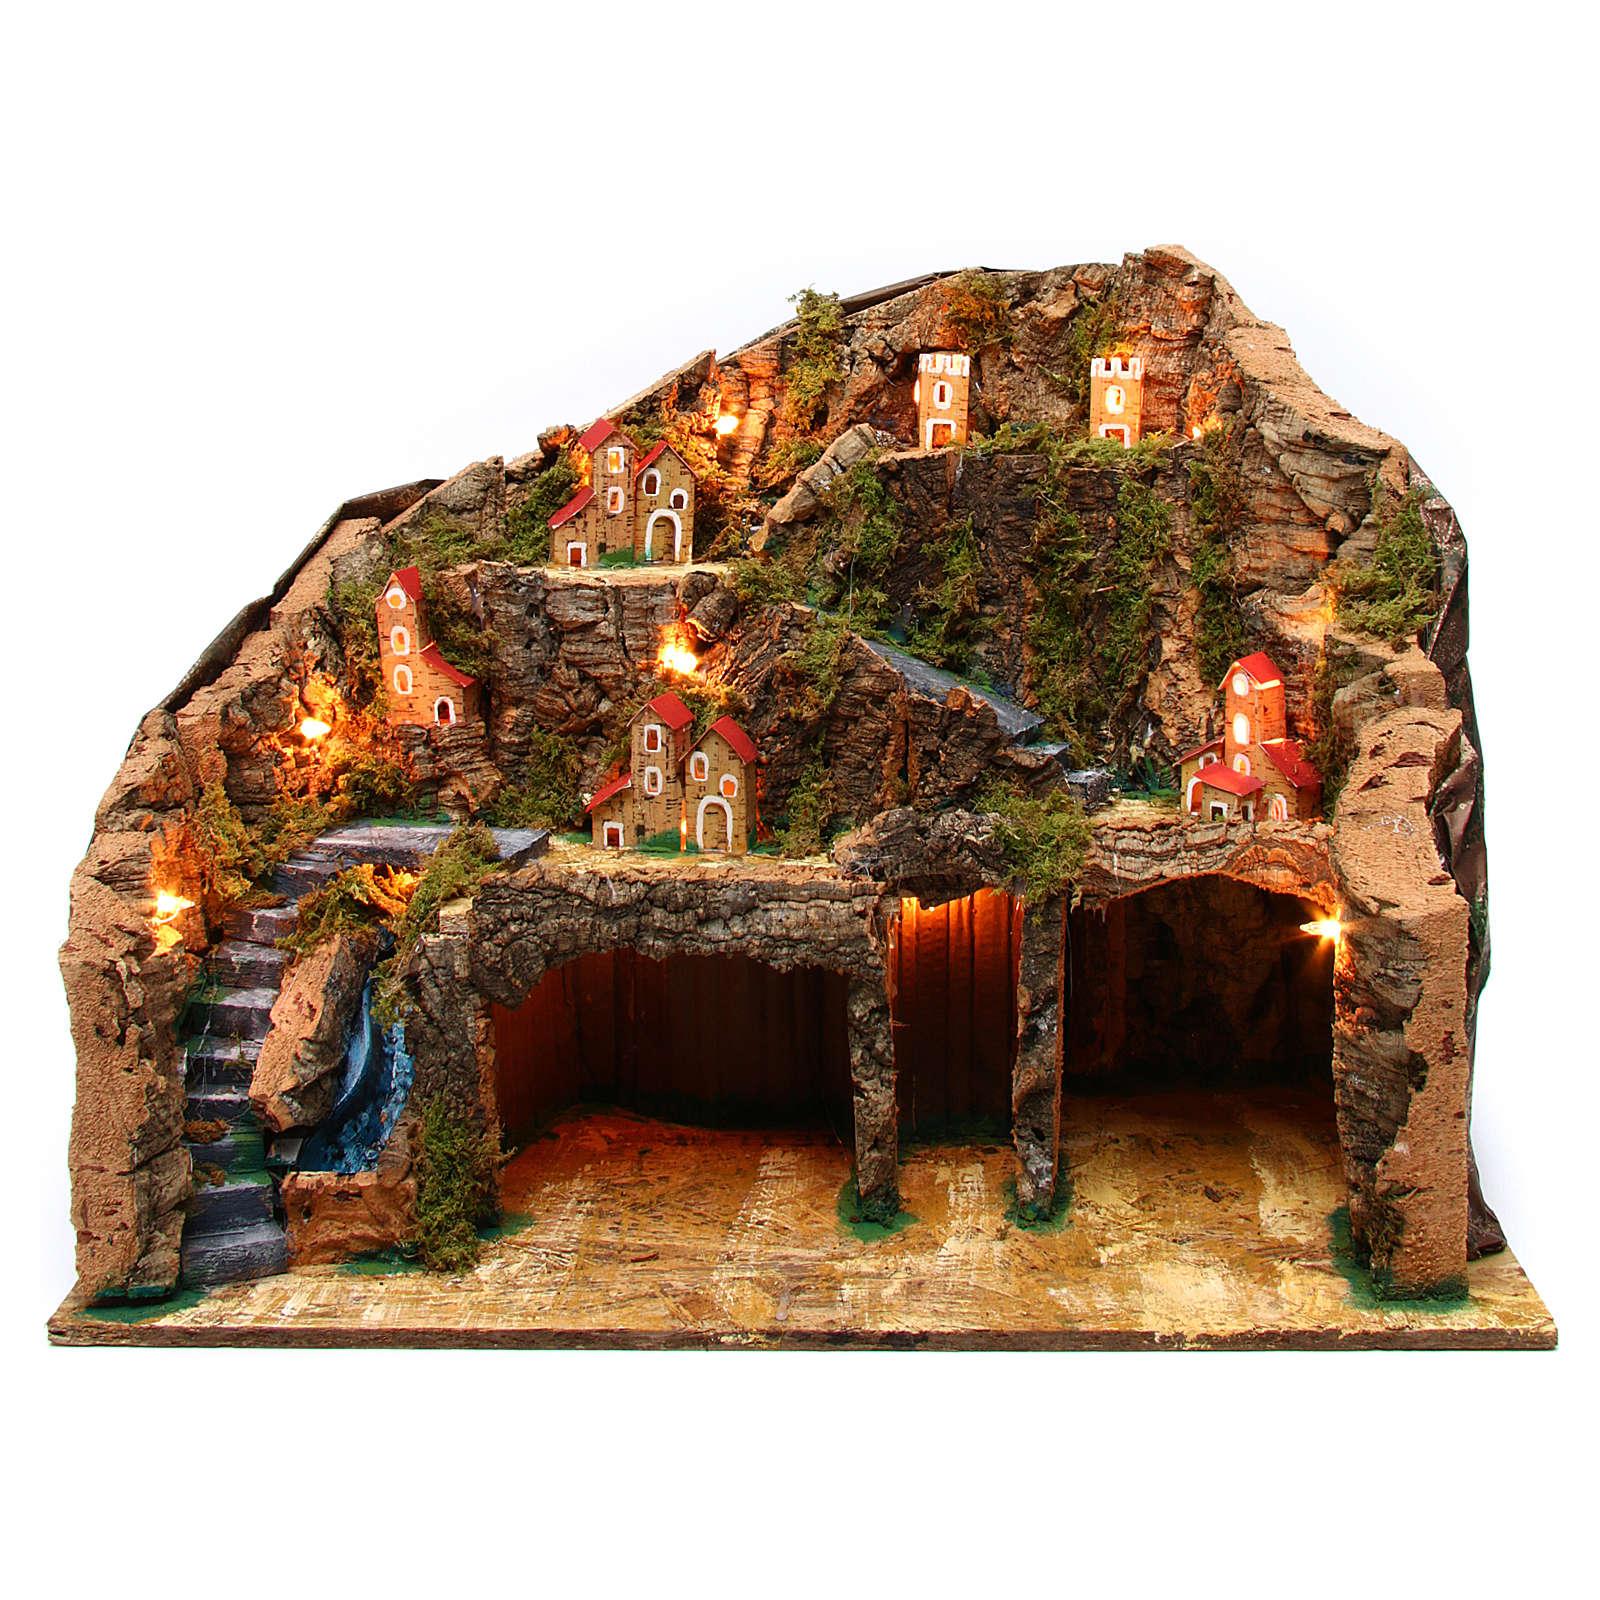 Holyart Borgo presepe Napoletano 60x35x40 cm per 10-12 cm